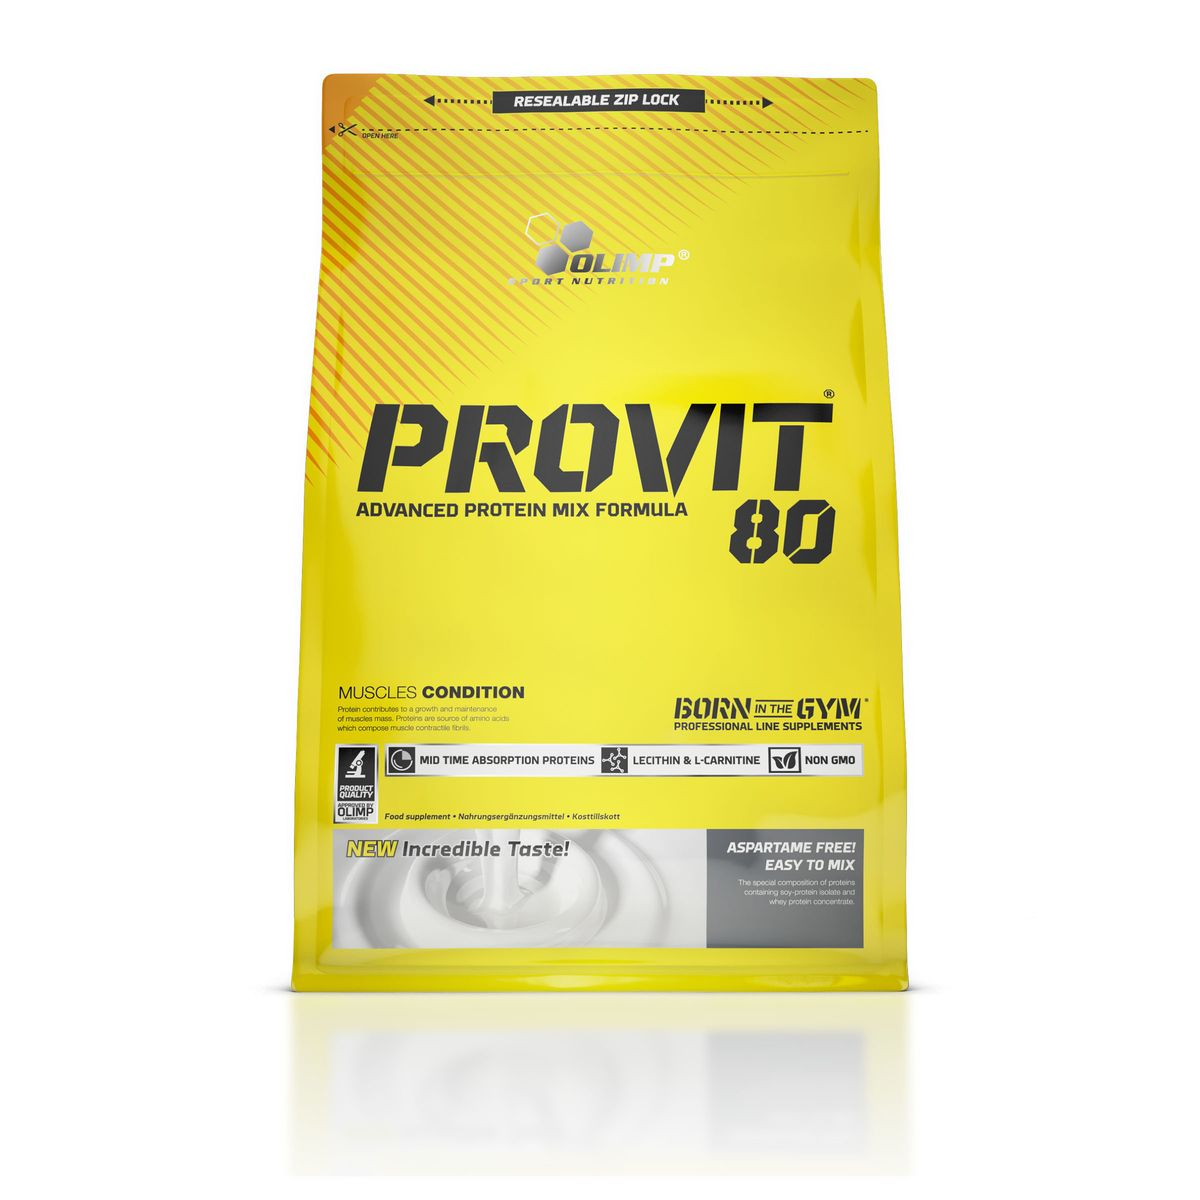 Протеин Olimp Sport Nutrition Provit 80, тирамису, 700 г аргинин olimp sport nutrition aakg 7500 extreme shot вишня 20 х 25 мл